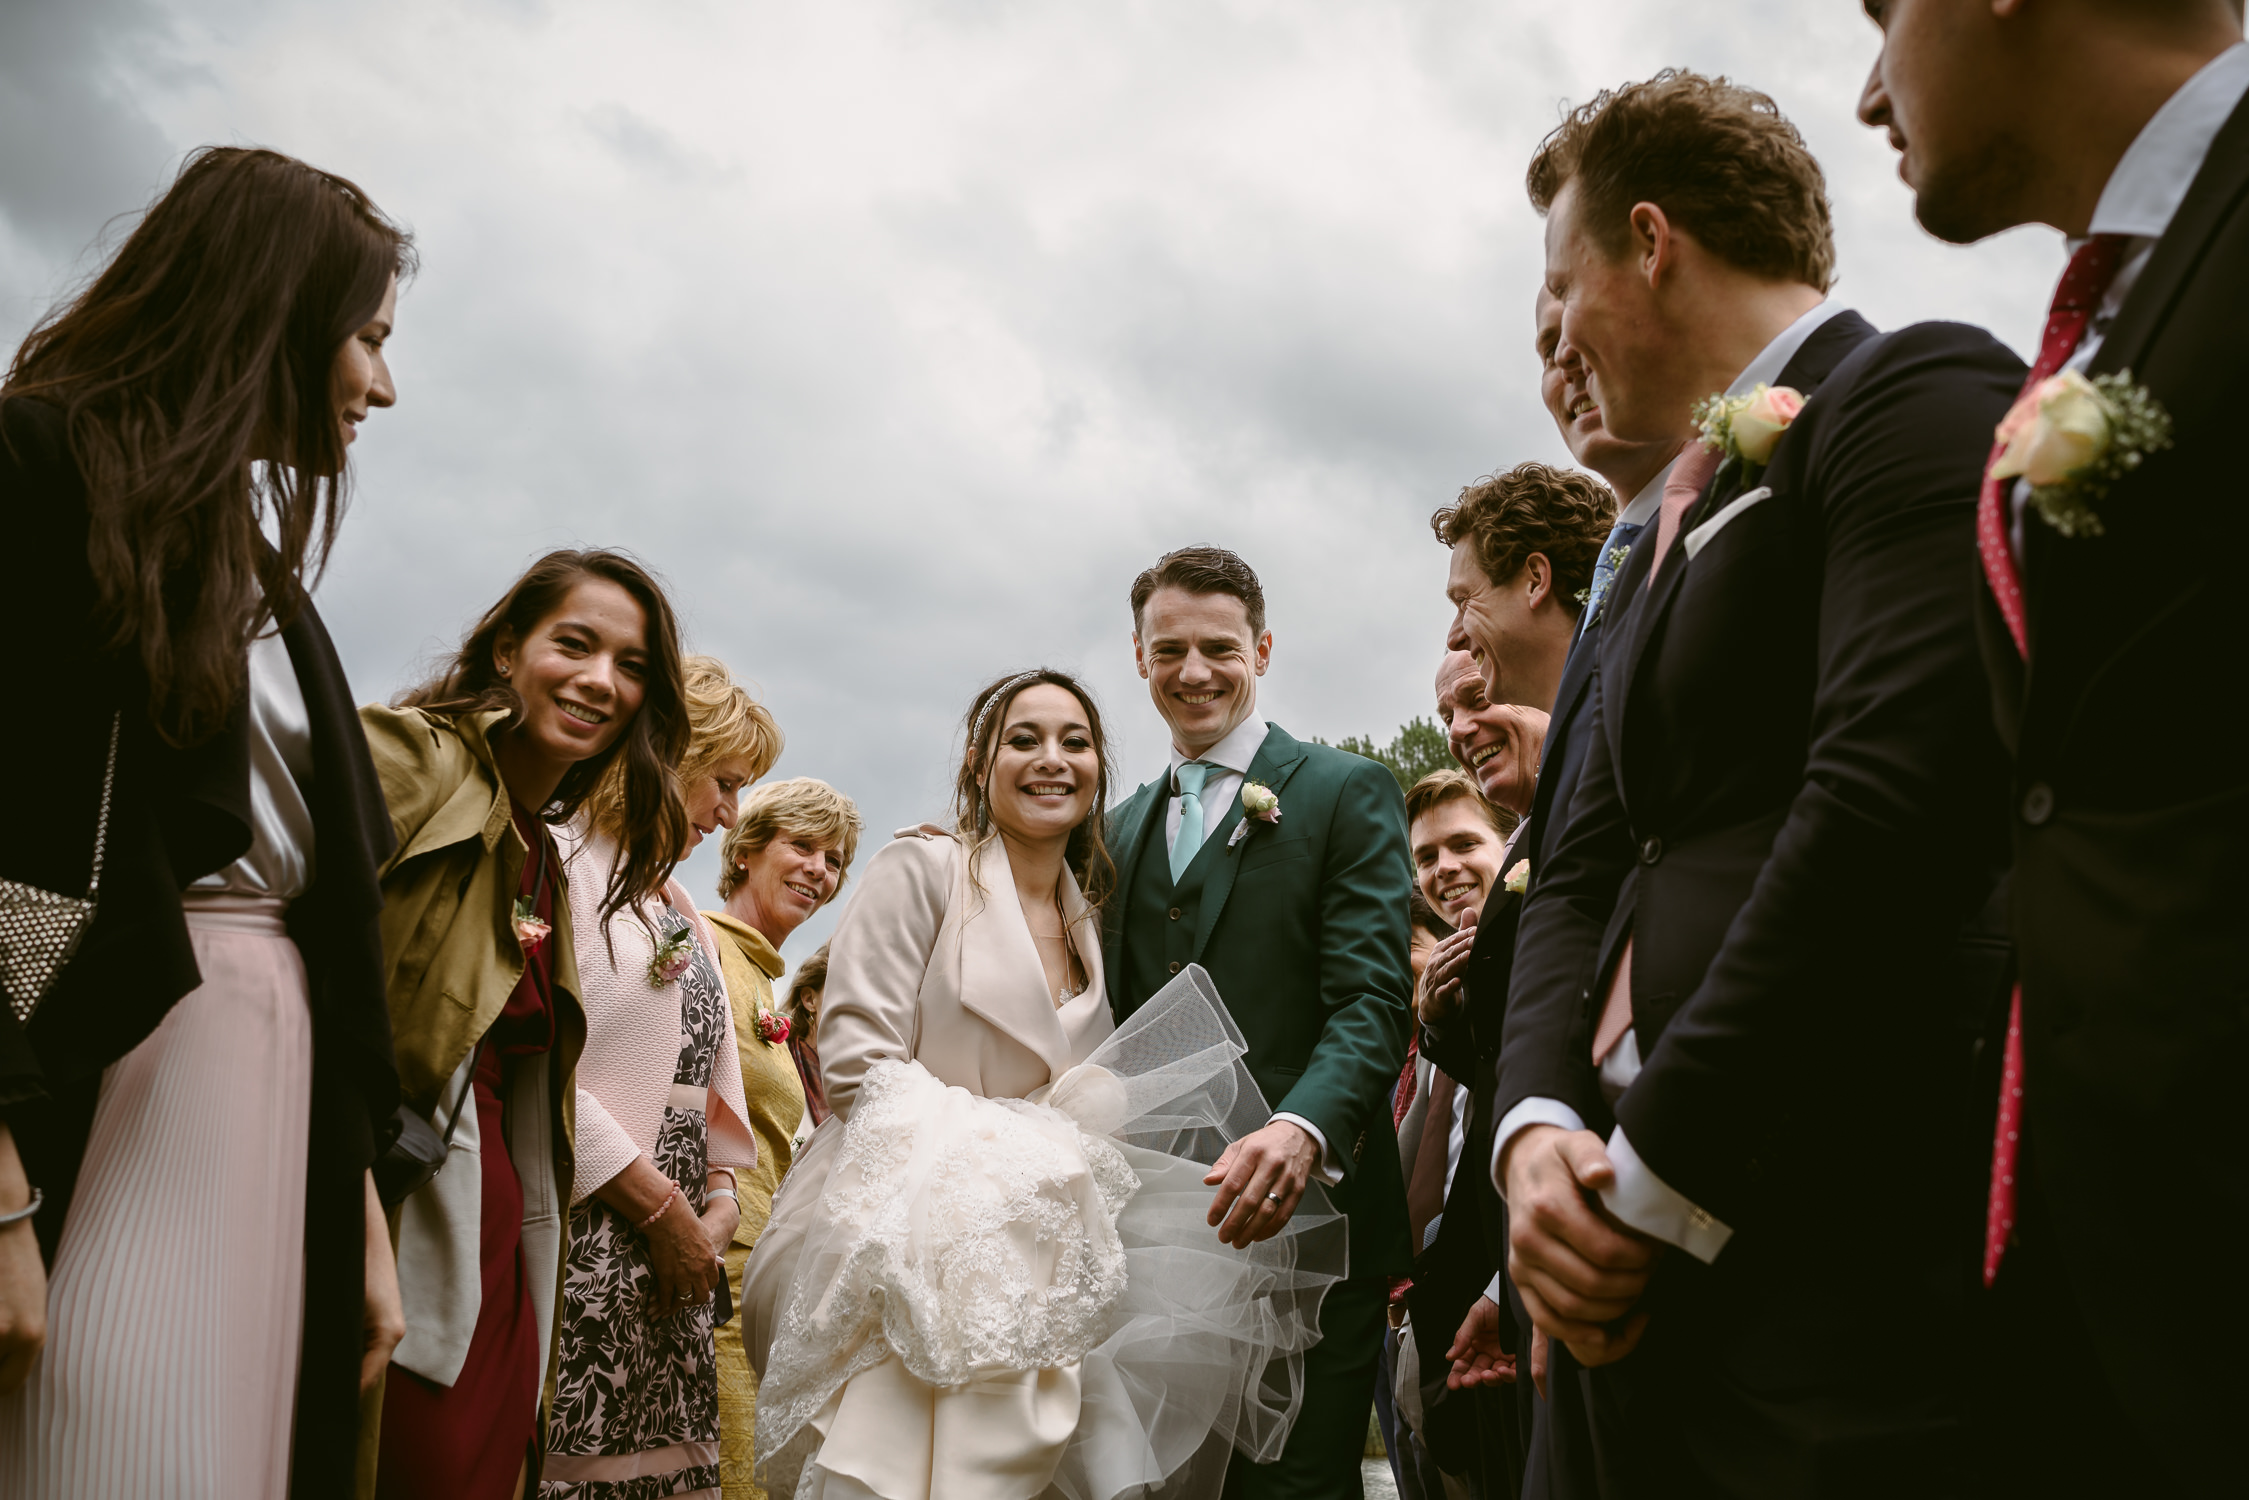 bruidsfotografie-amsterdam-utrecht-trouwfotograaf-mark-hadden-wedding-photography-Robin & Guus-127.jpg